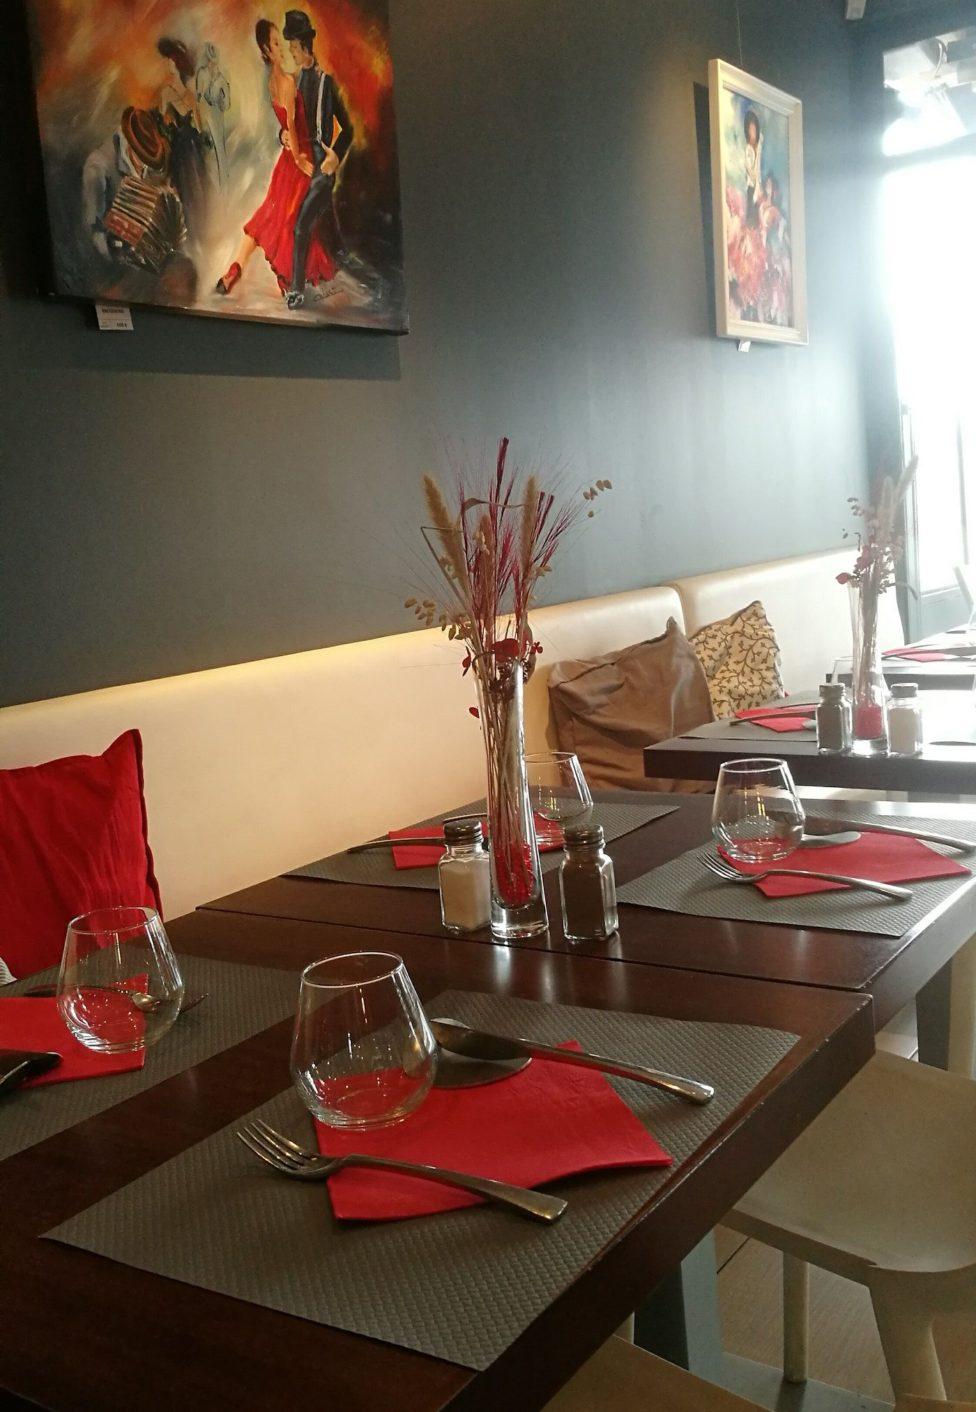 Tourissima blog food restaurants h tels - Comptoir gourmand toulouse ...